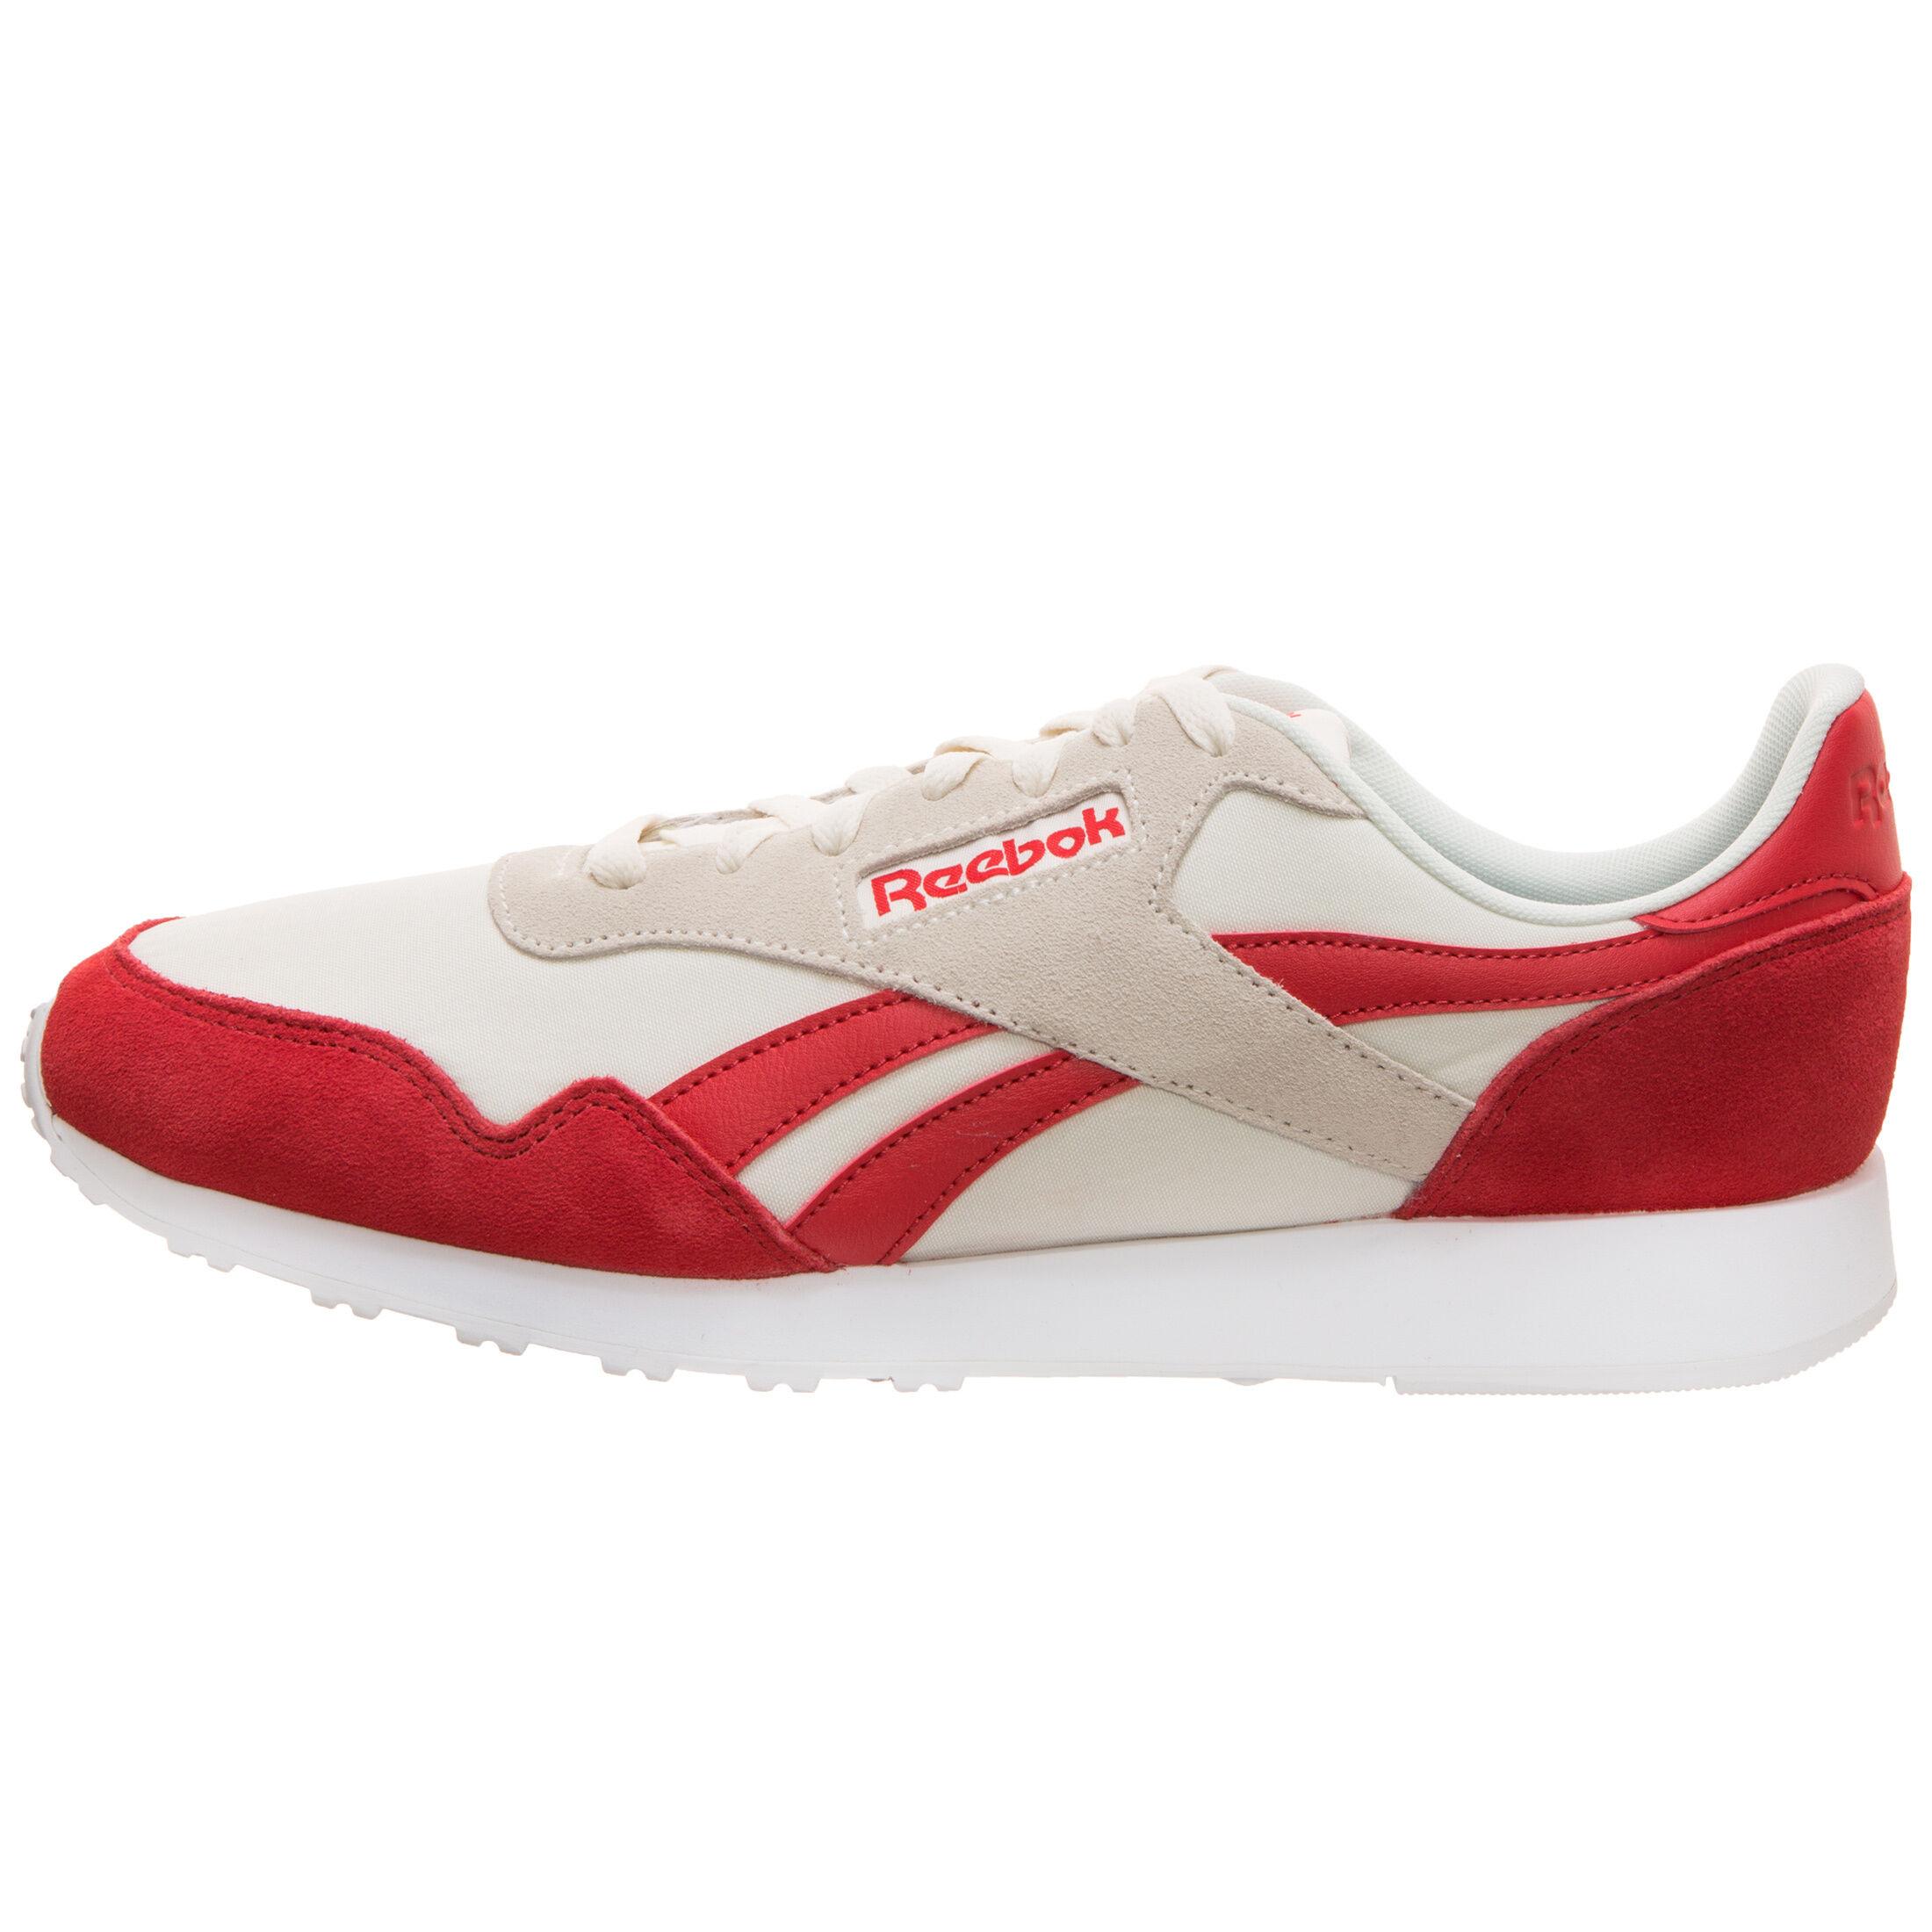 Reebok Royal Ultra Sneaker Herren bei OUTFITTER